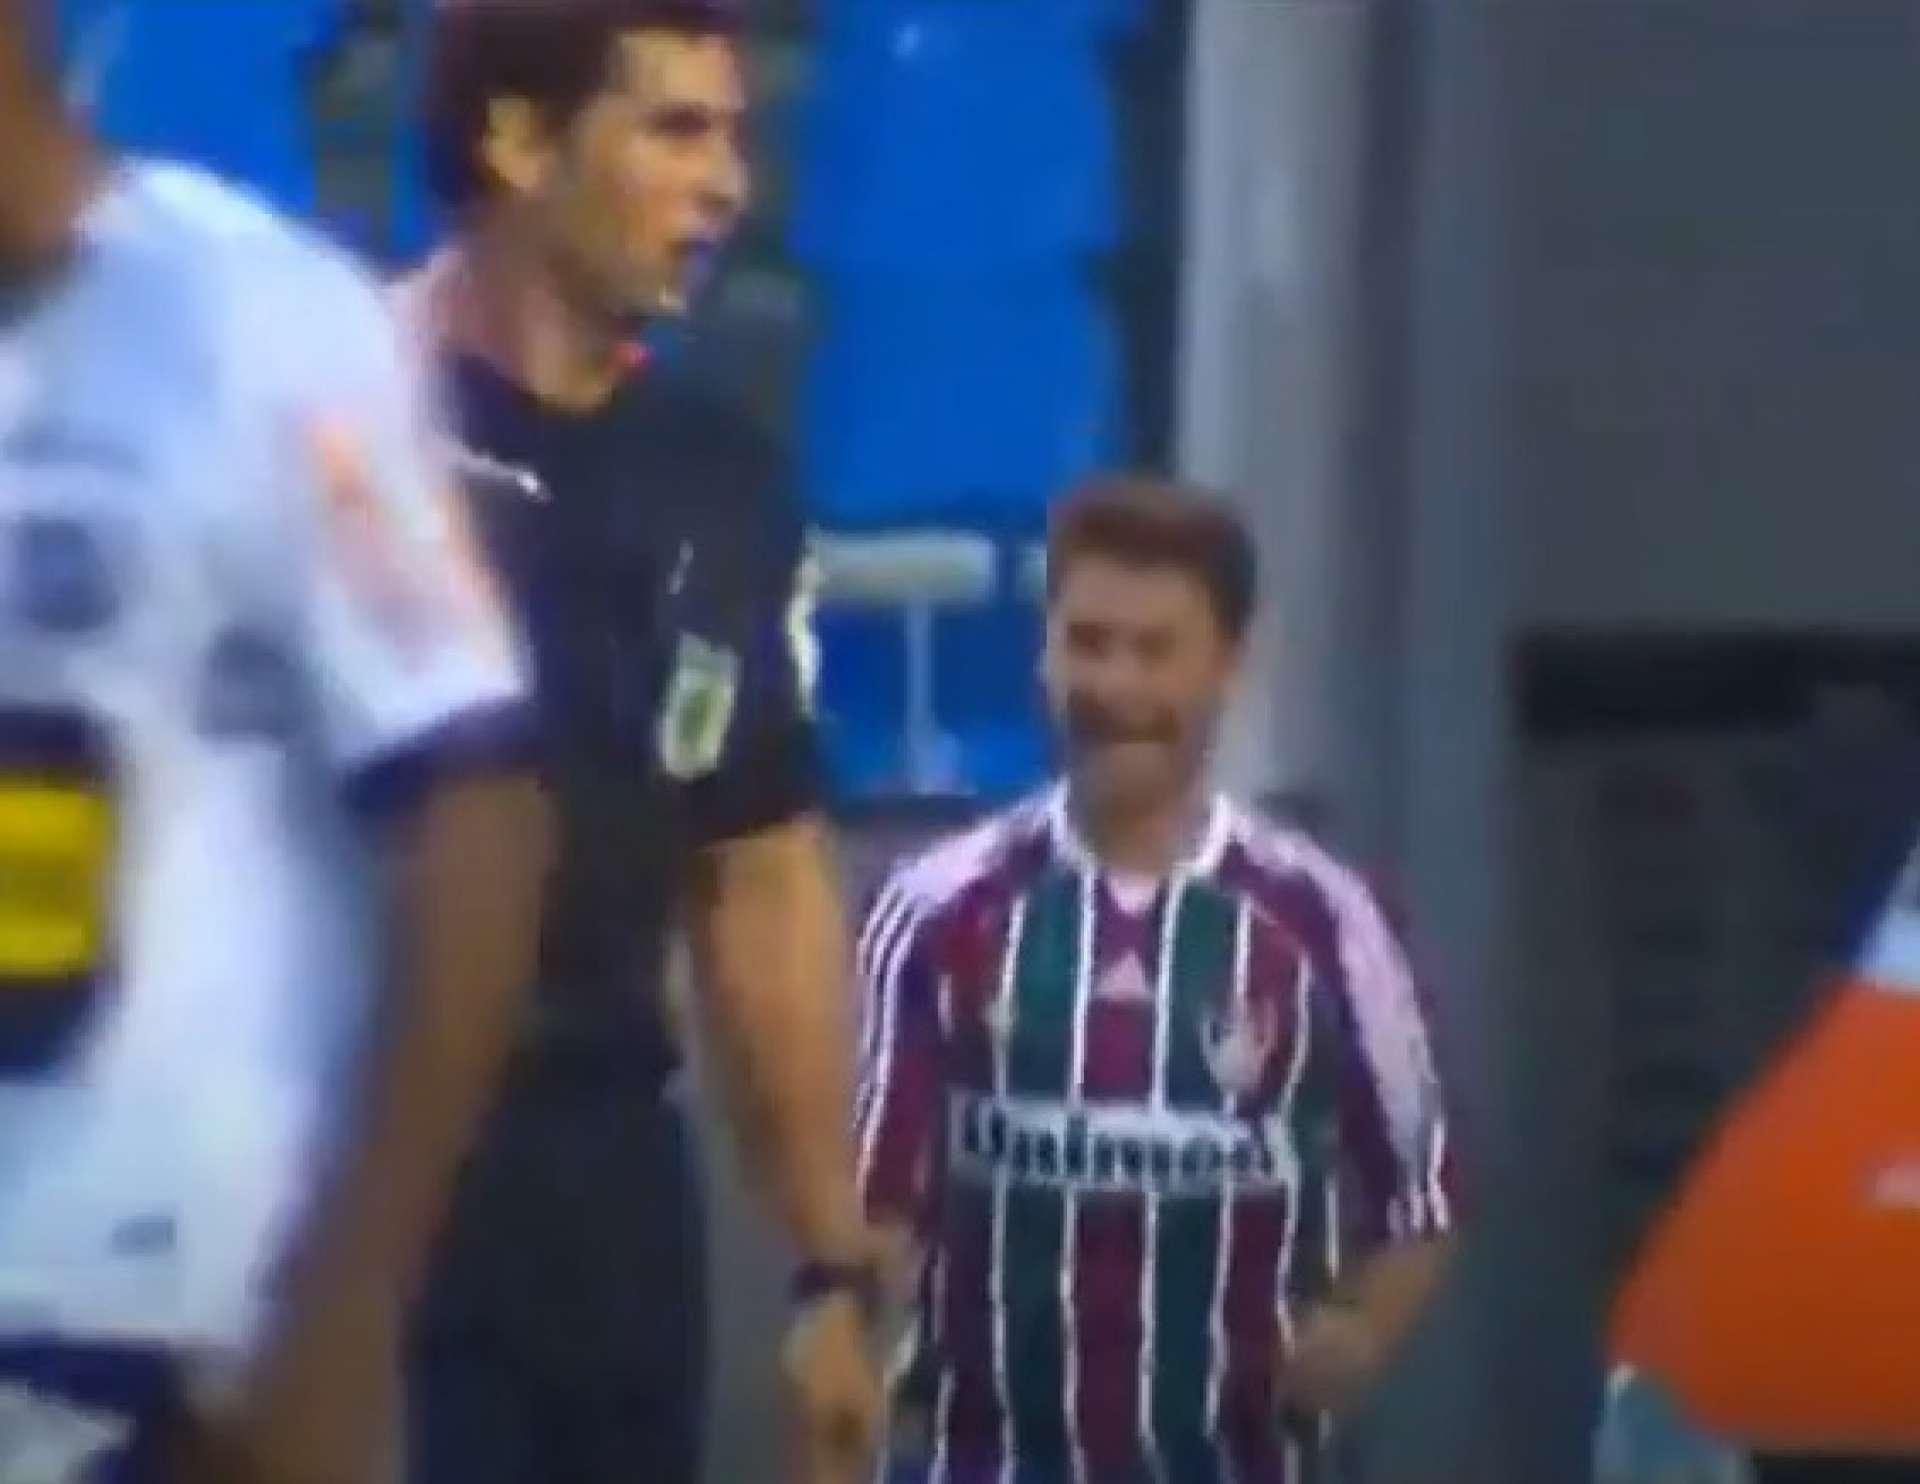 ÁRBITRO Wagner Reway assinala gol de Rafael Sóbis, na vitória do Fluminense sobre o Ceará